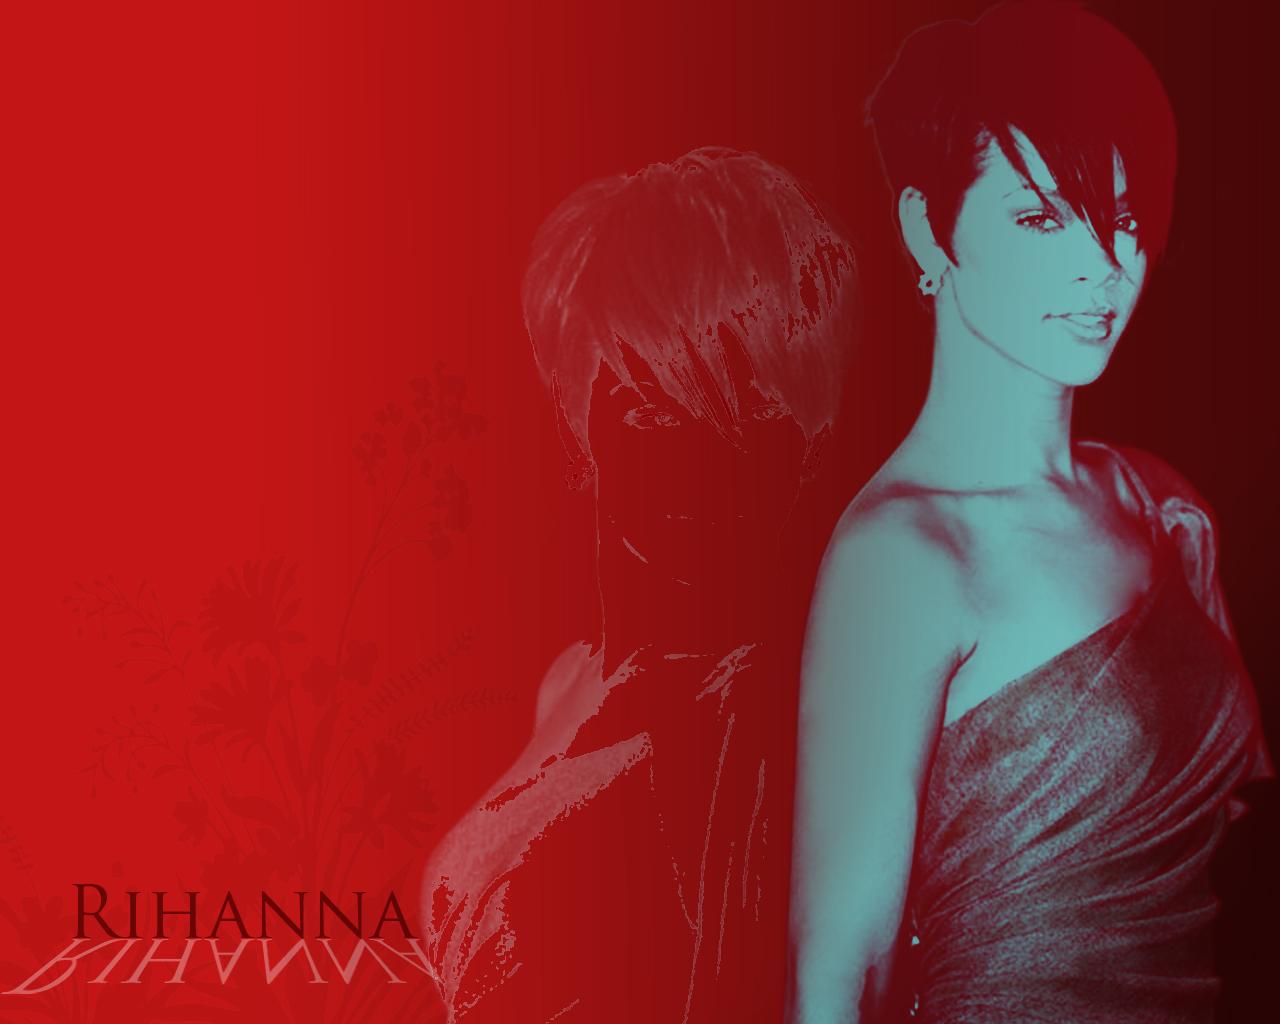 http://images2.fanpop.com/images/photos/2800000/Rihanna-rihanna-2832181-1280-1024.jpg